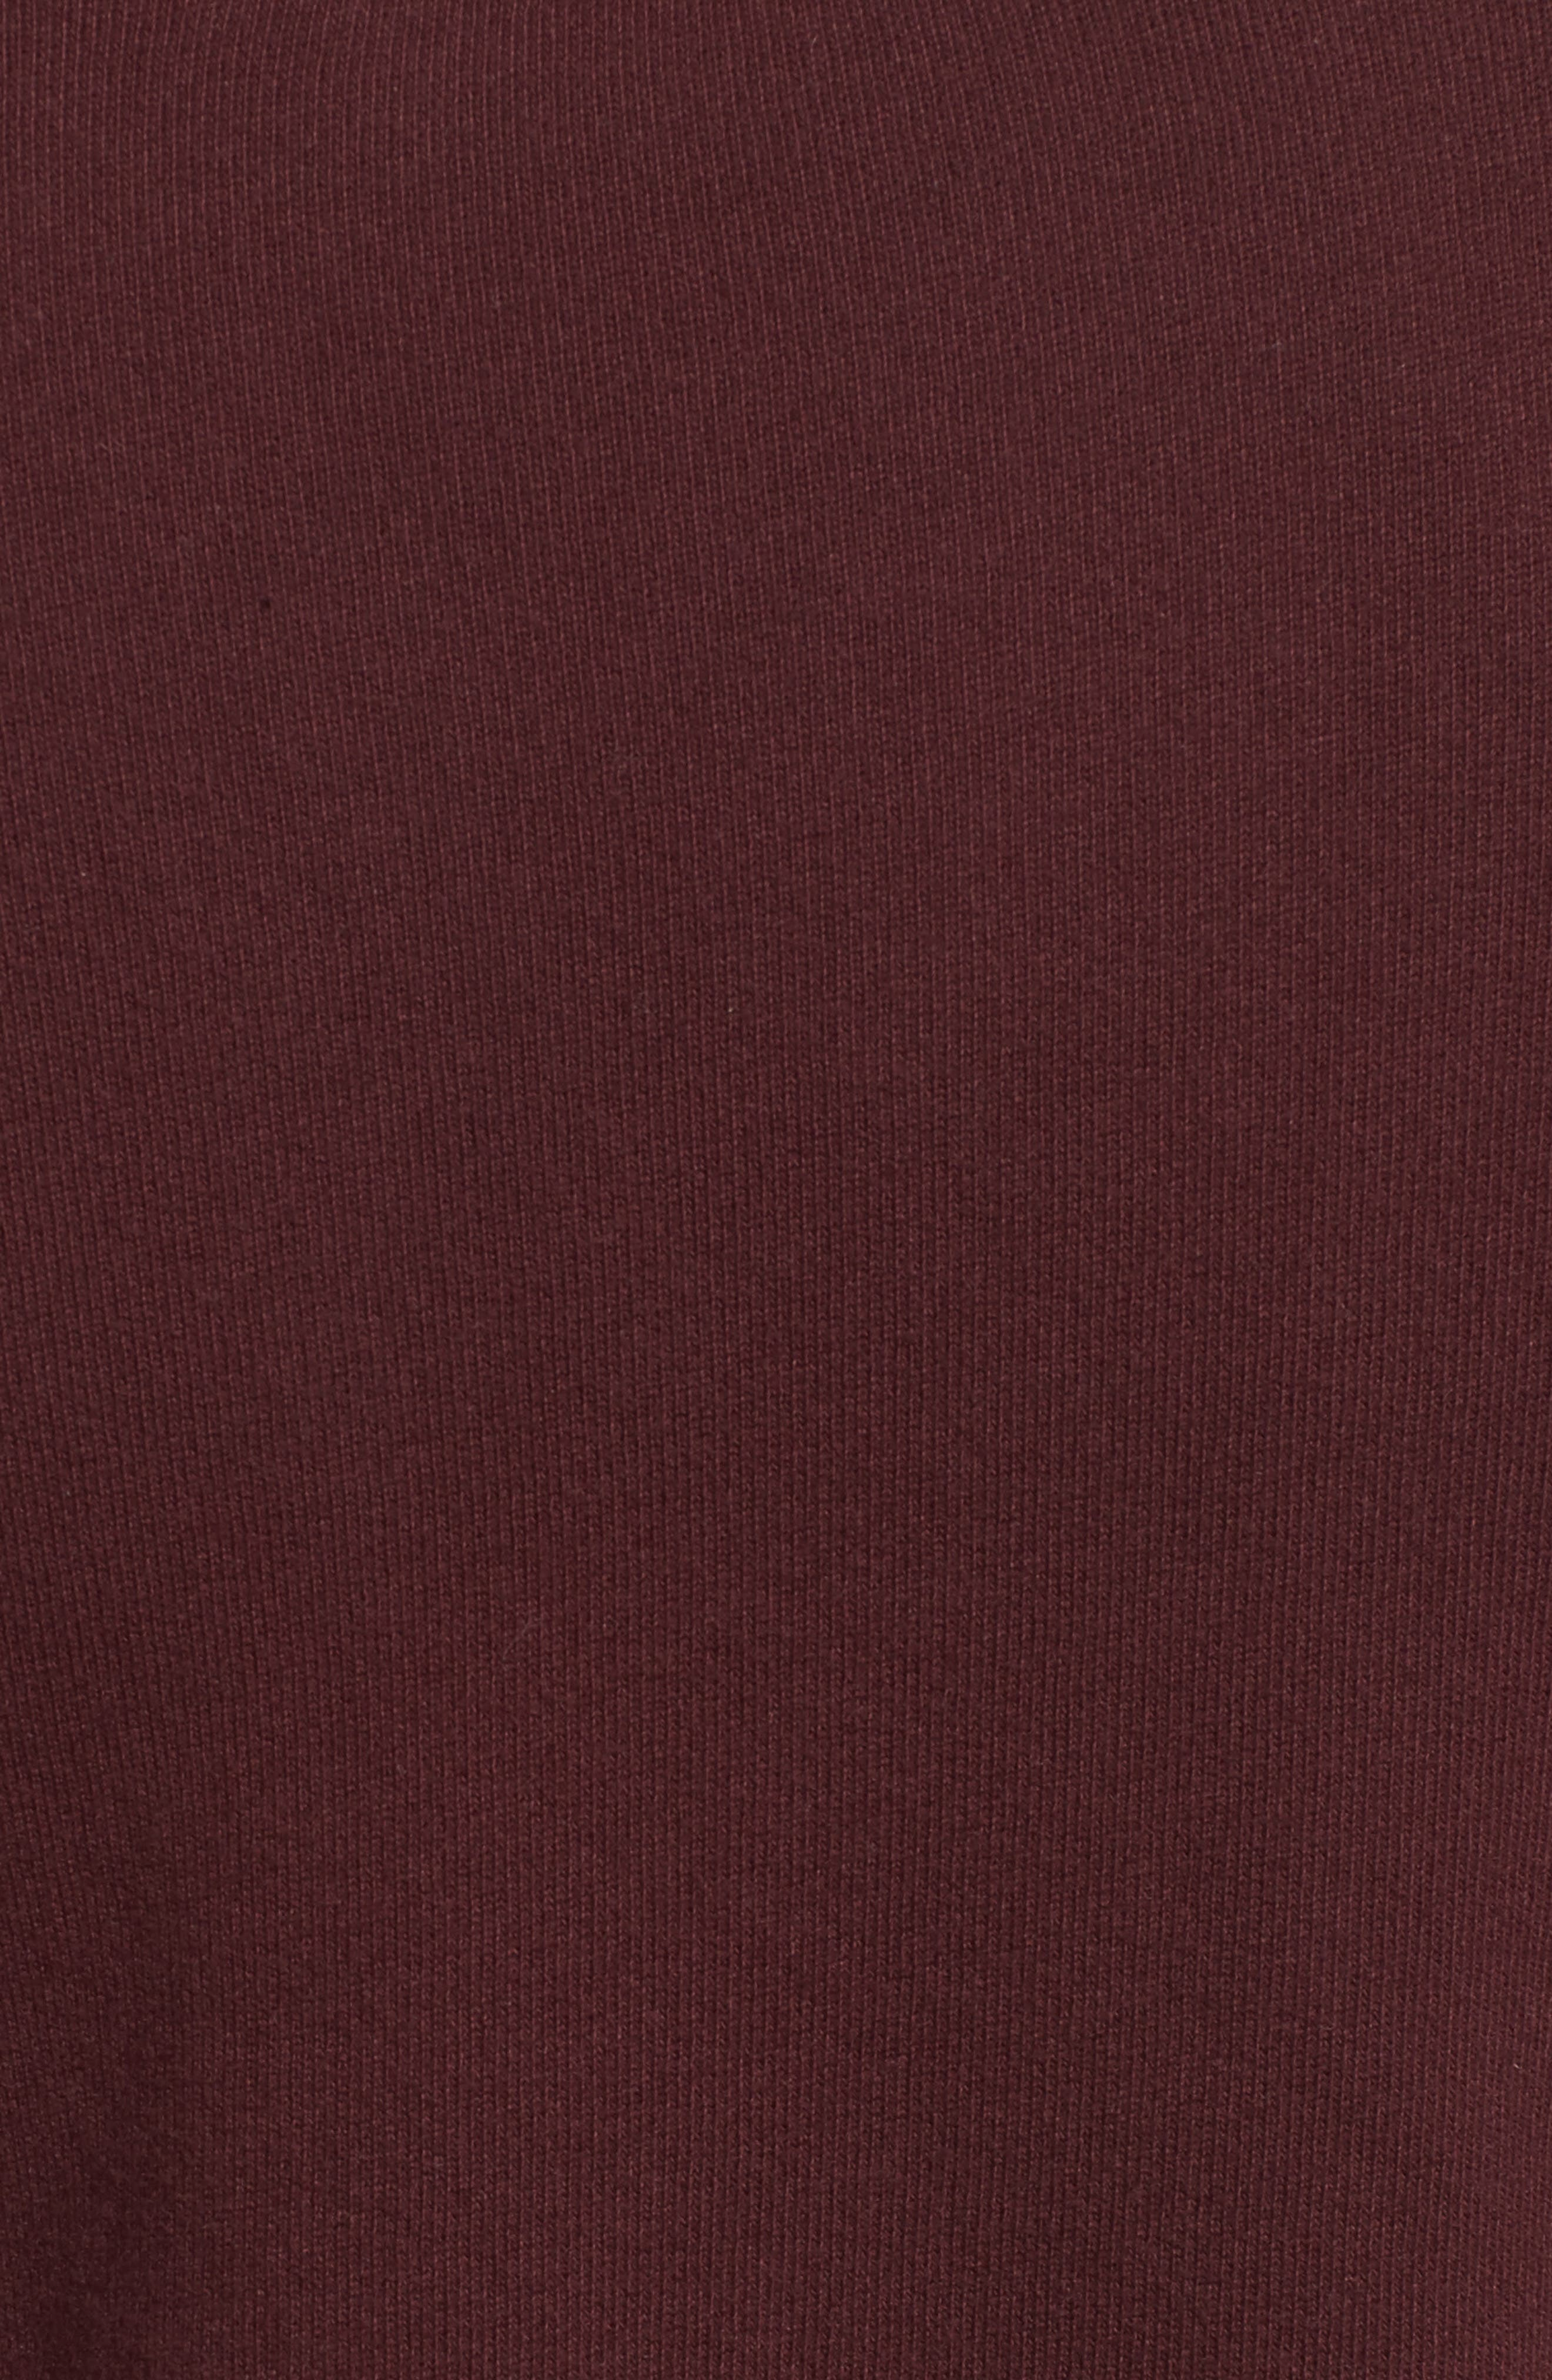 Zip Fleece Jacket,                             Alternate thumbnail 5, color,                             Vamp